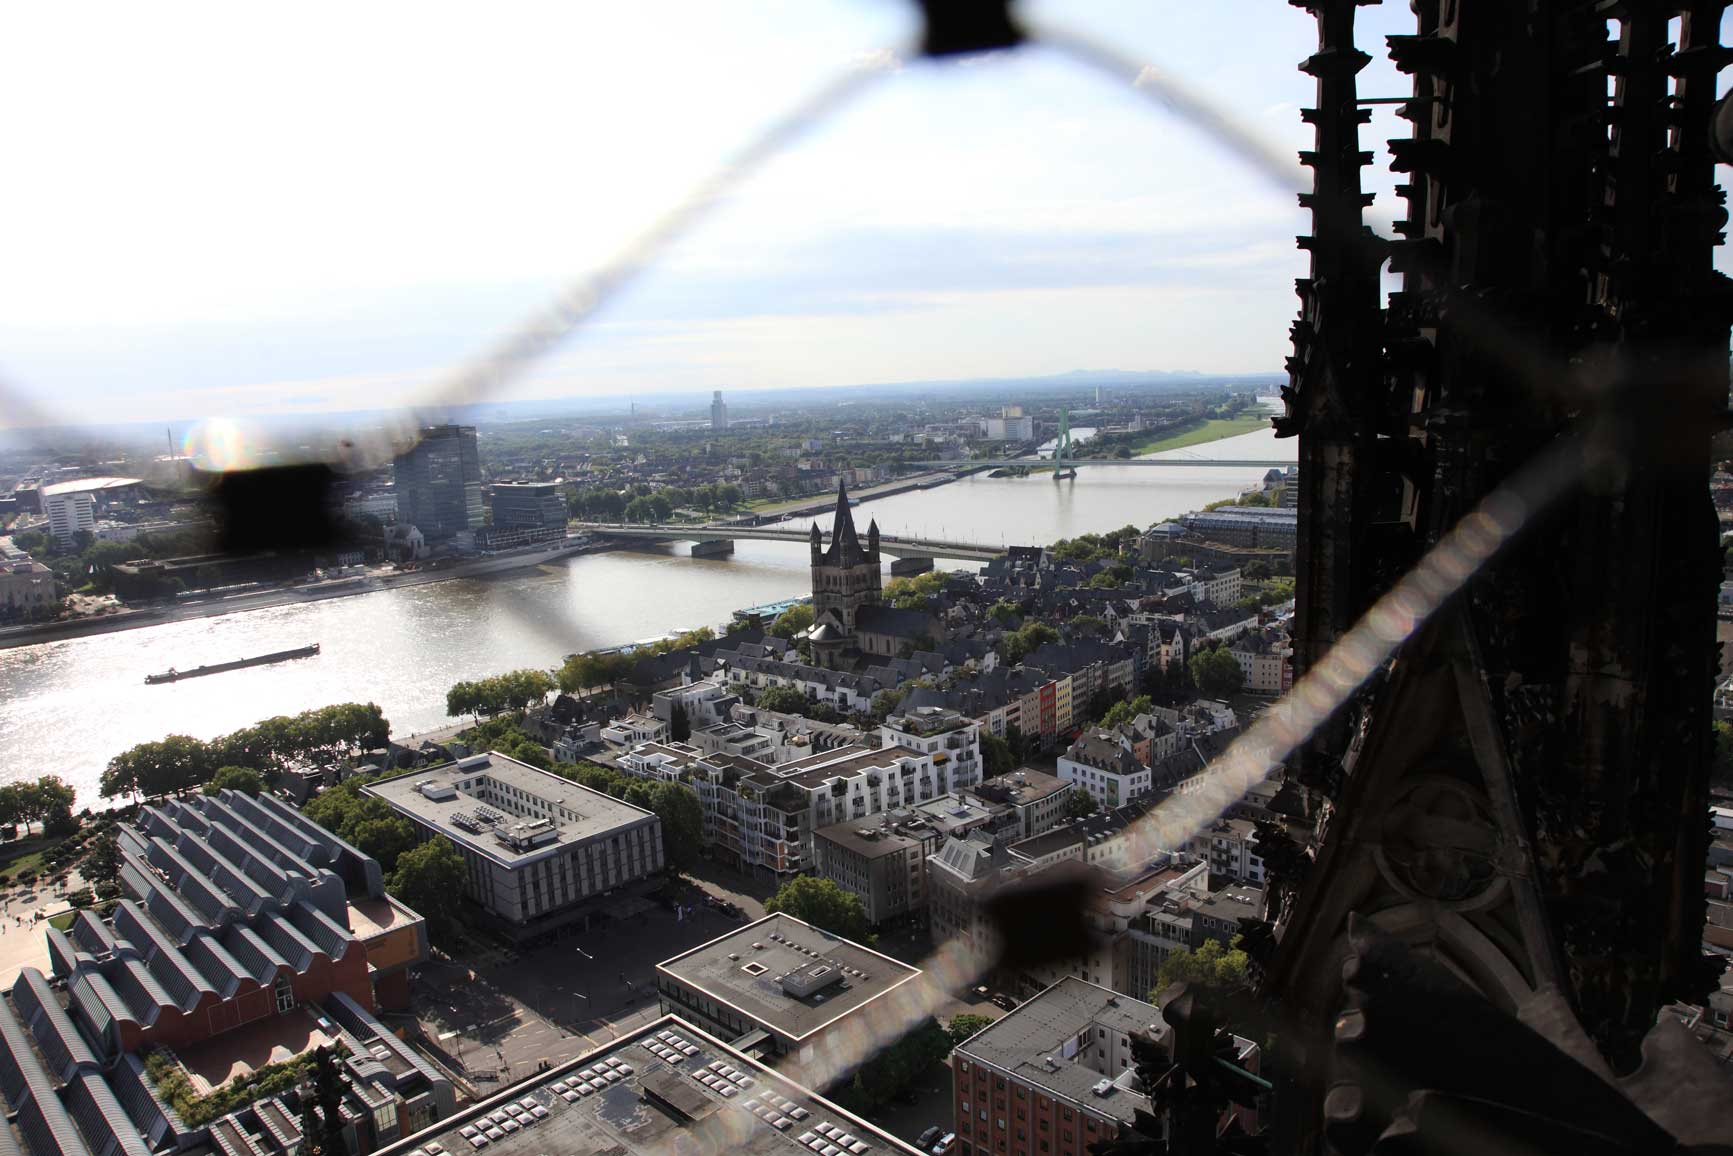 Rhine-17-08-14_11-25-58